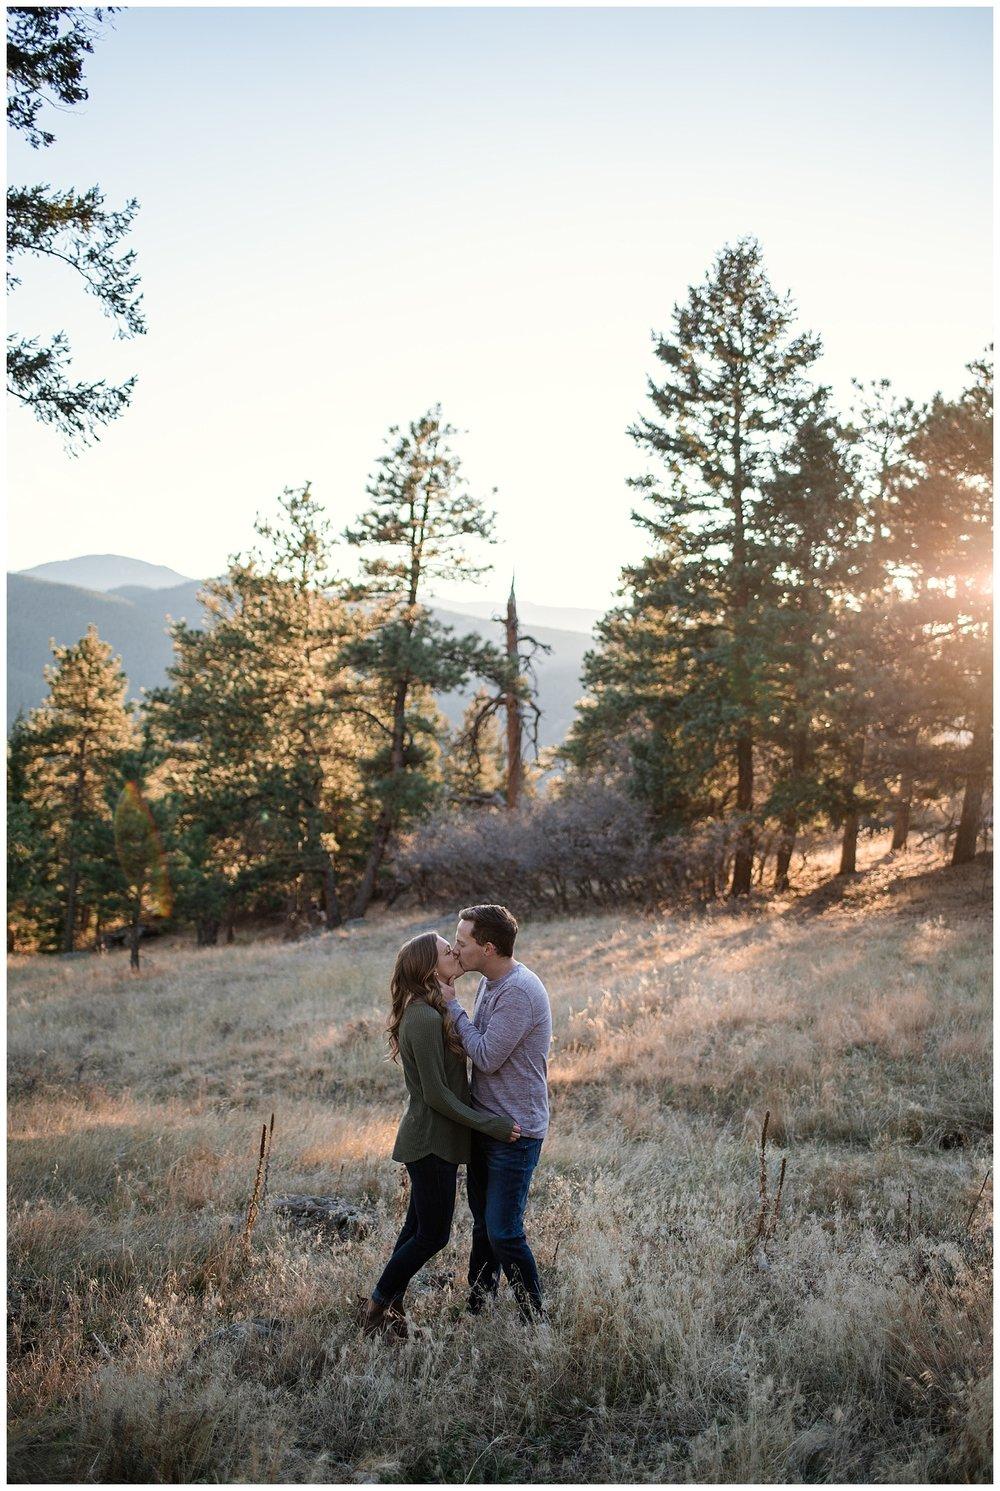 Mt Falcon Engagement Session, Colorado Wedding Photographer, Denver Engagement Session, Denver Engagement Photographer, Denver Wedding Photographer, Mountain Engagement Photography,